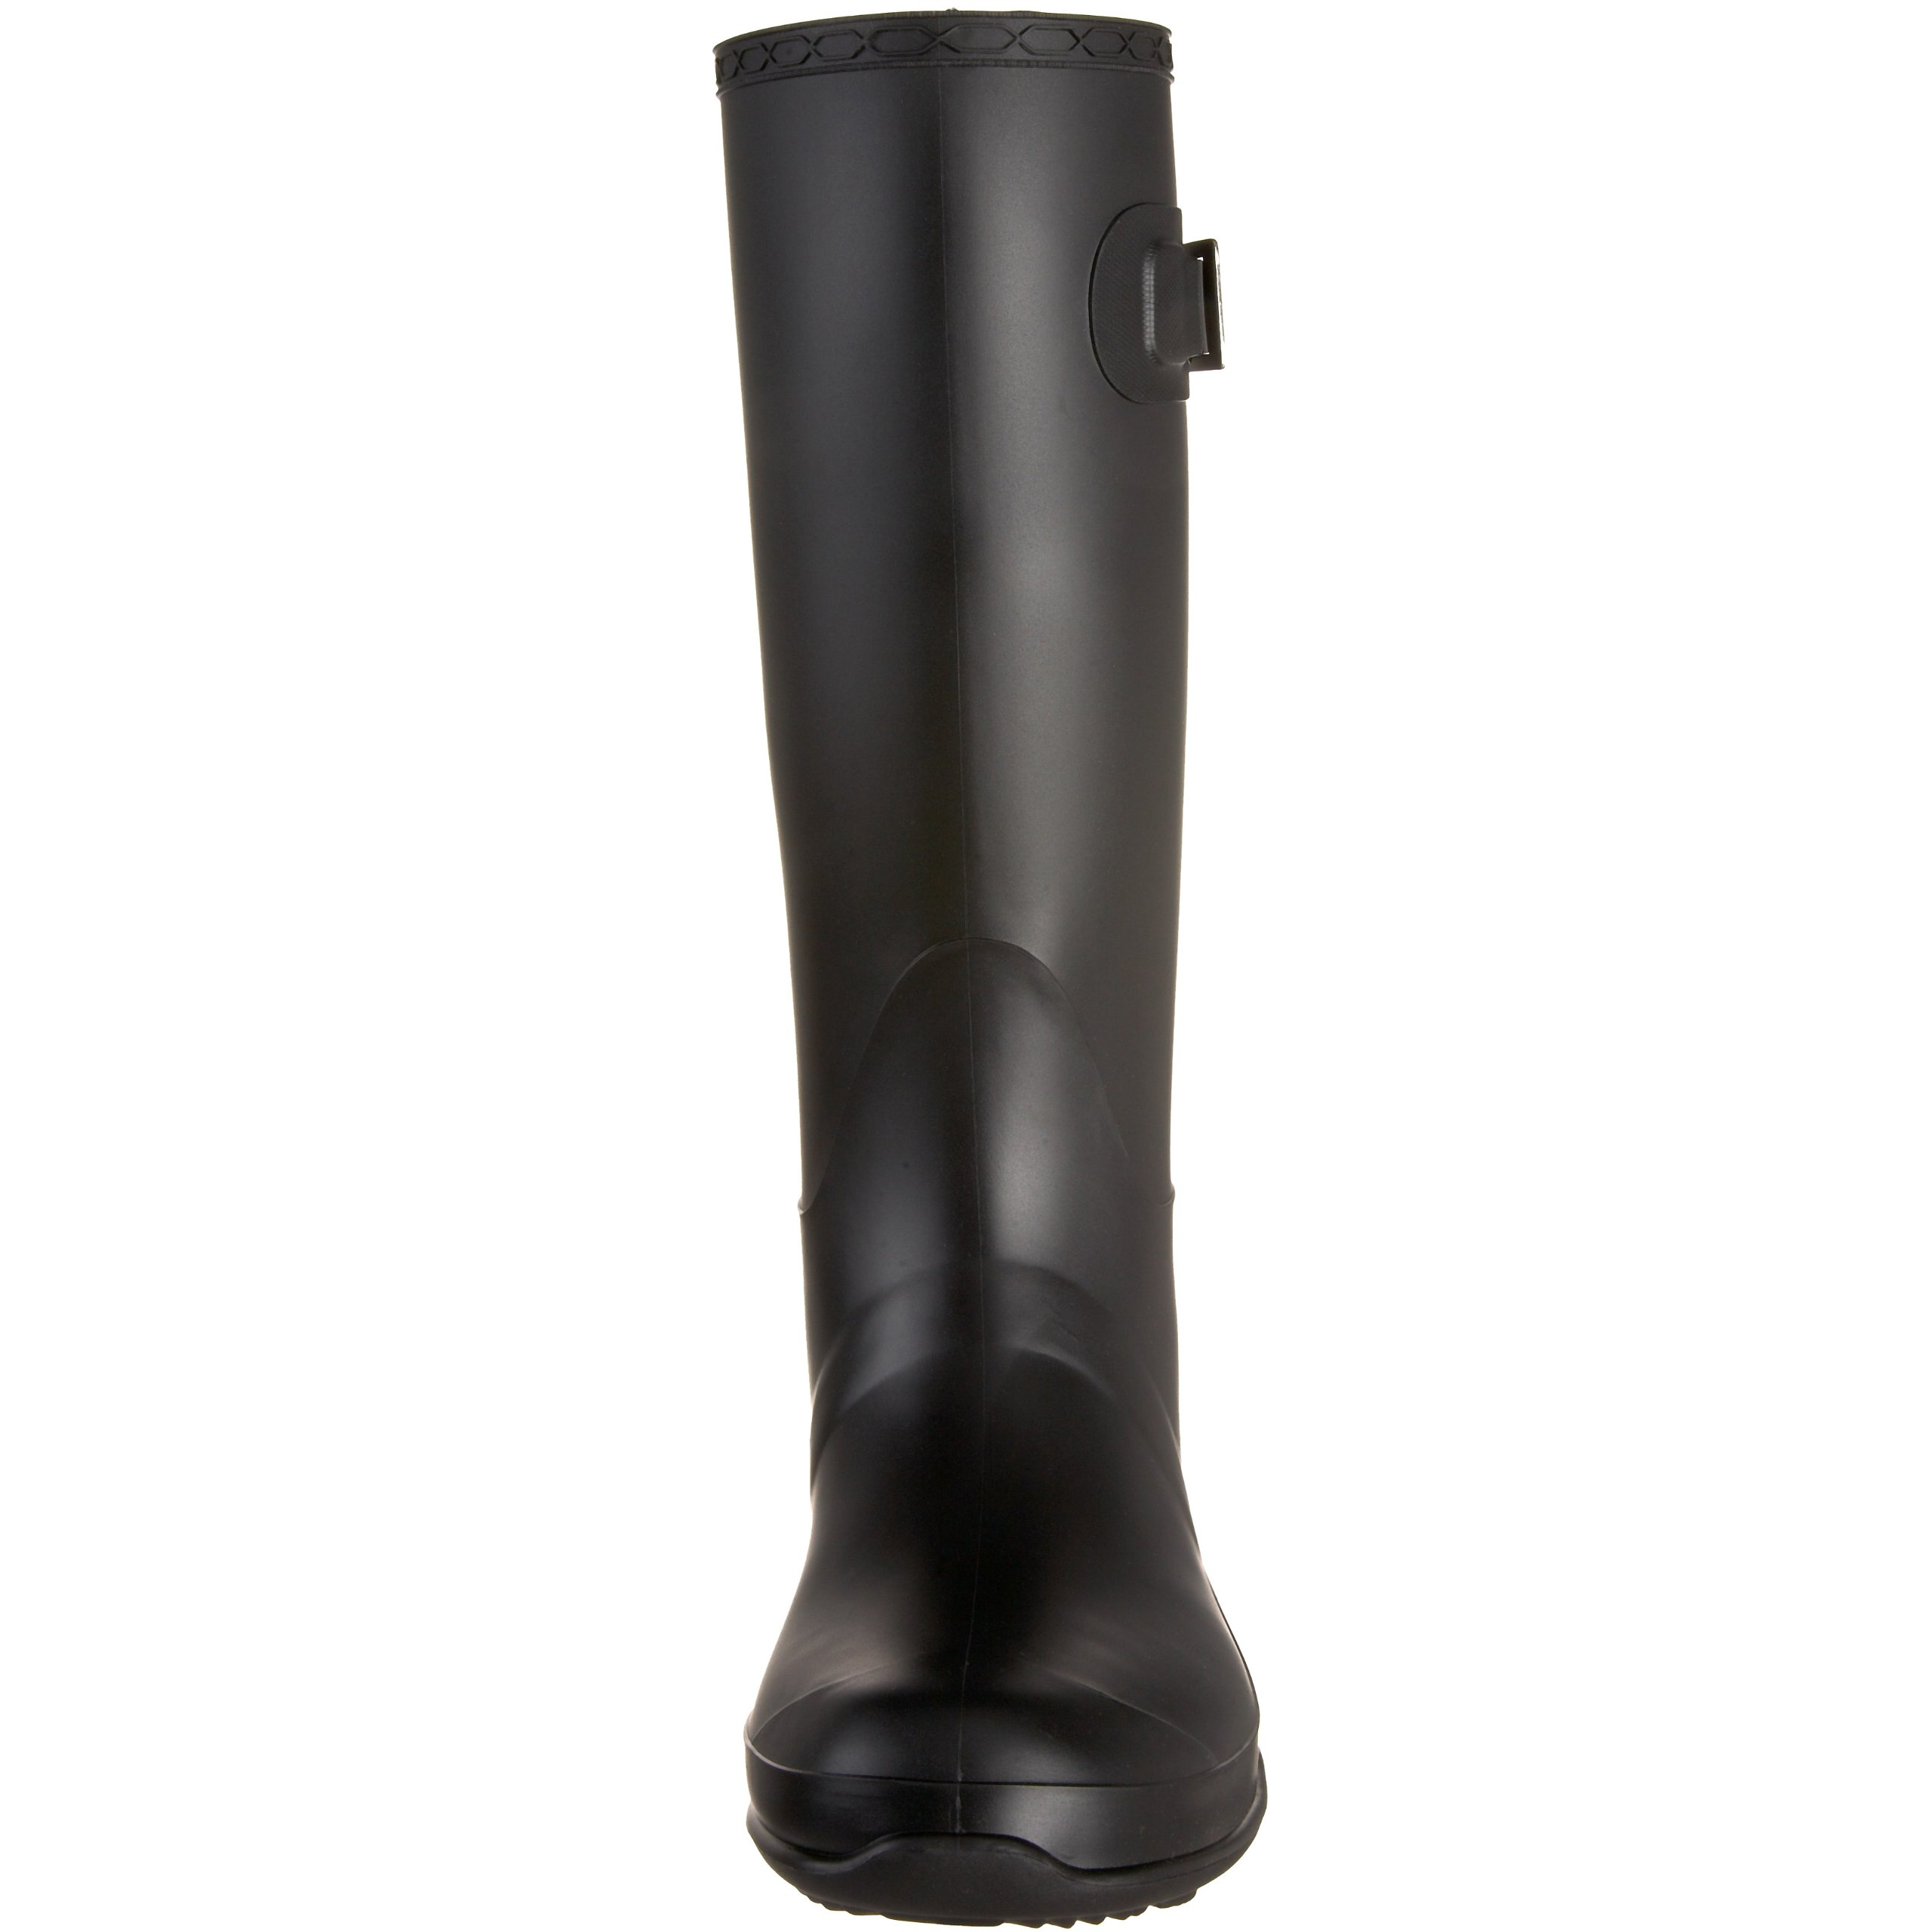 Kamik Women's Olivia Rain Boot,Black,9 M US by Kamik (Image #4)